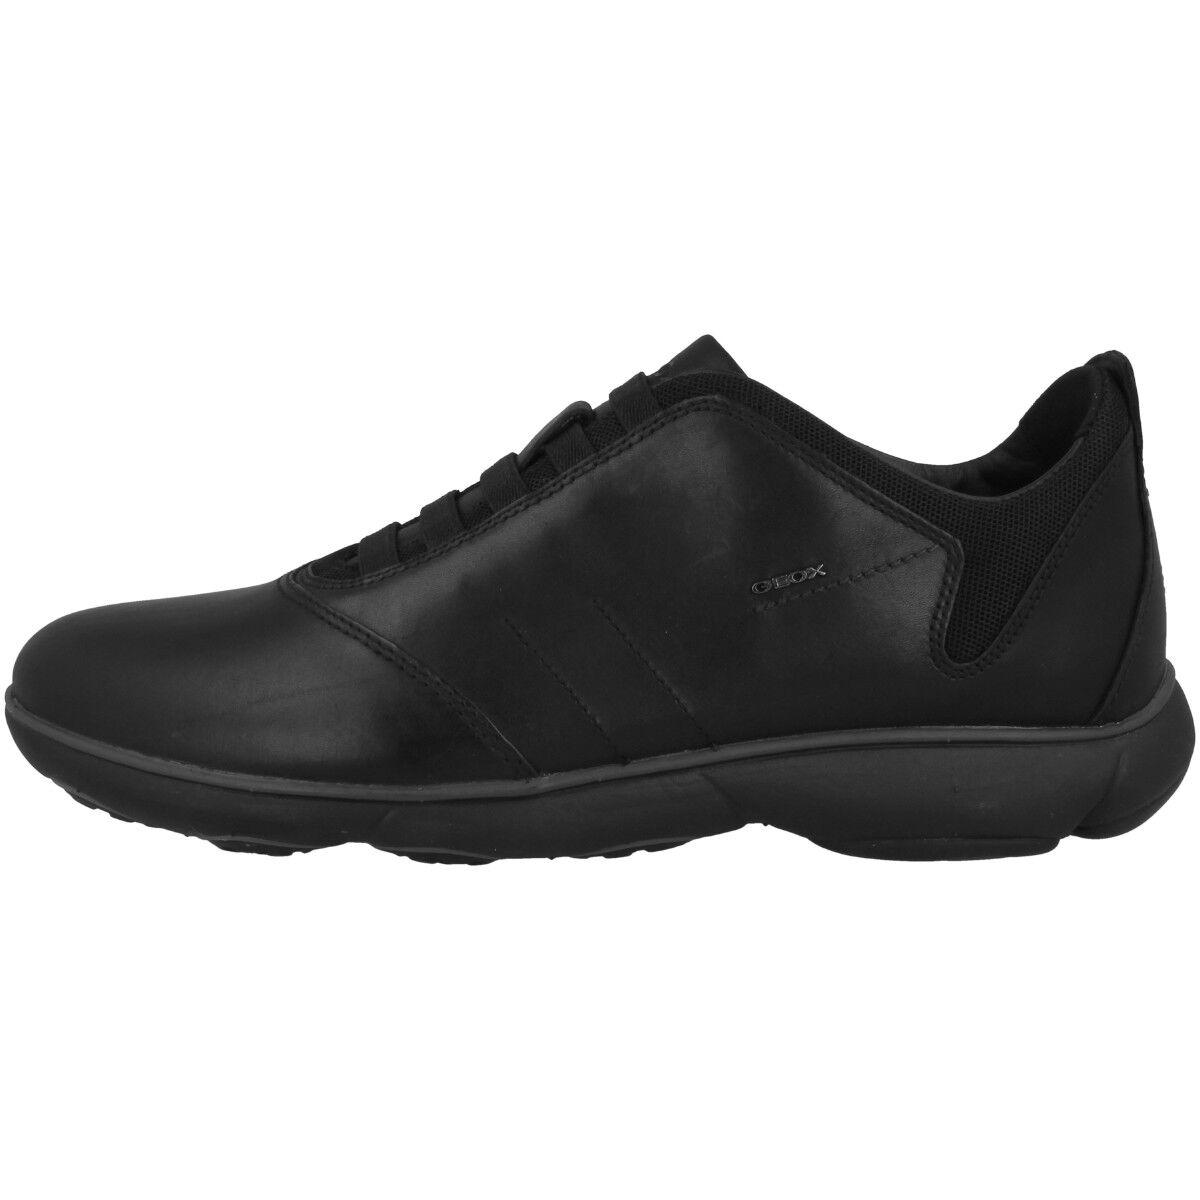 GEOX U Nebula B Schuhe Herren Sneaker Freizeit Halbschuhe black U52D7B00046C9999